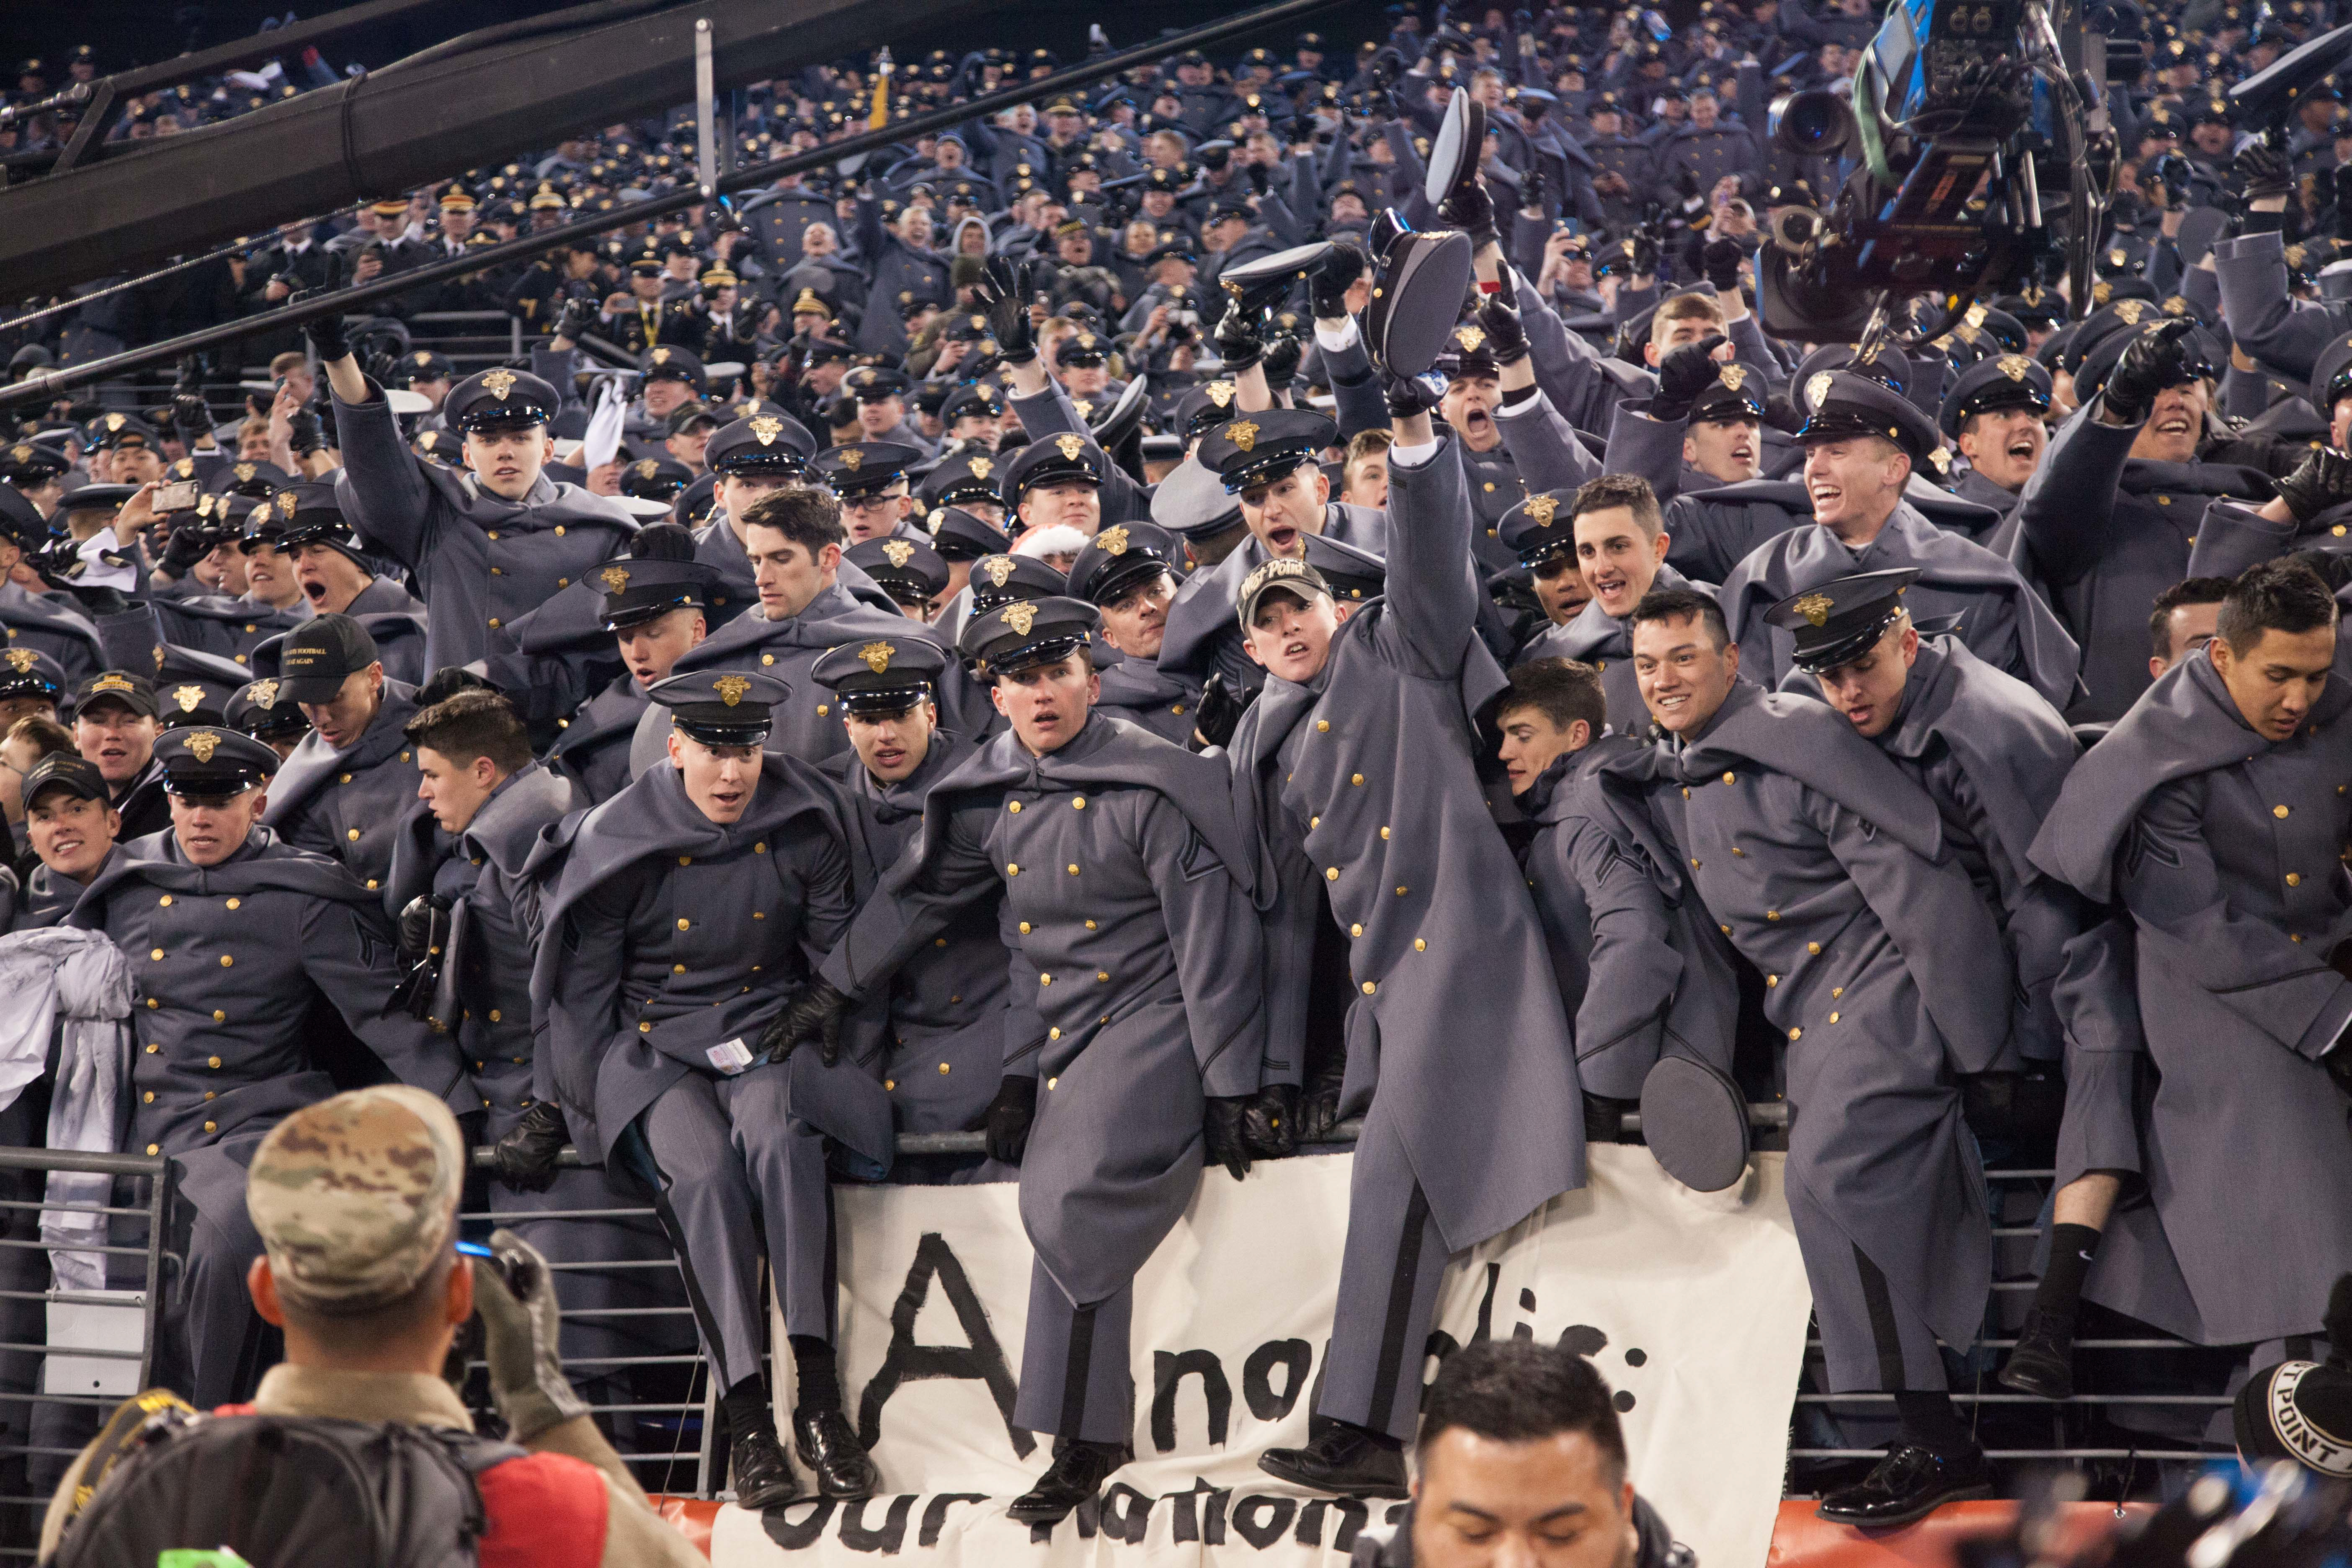 Army Navy Game 2017 Philadelphia >> army navy game 2017 | عکس ایمگور